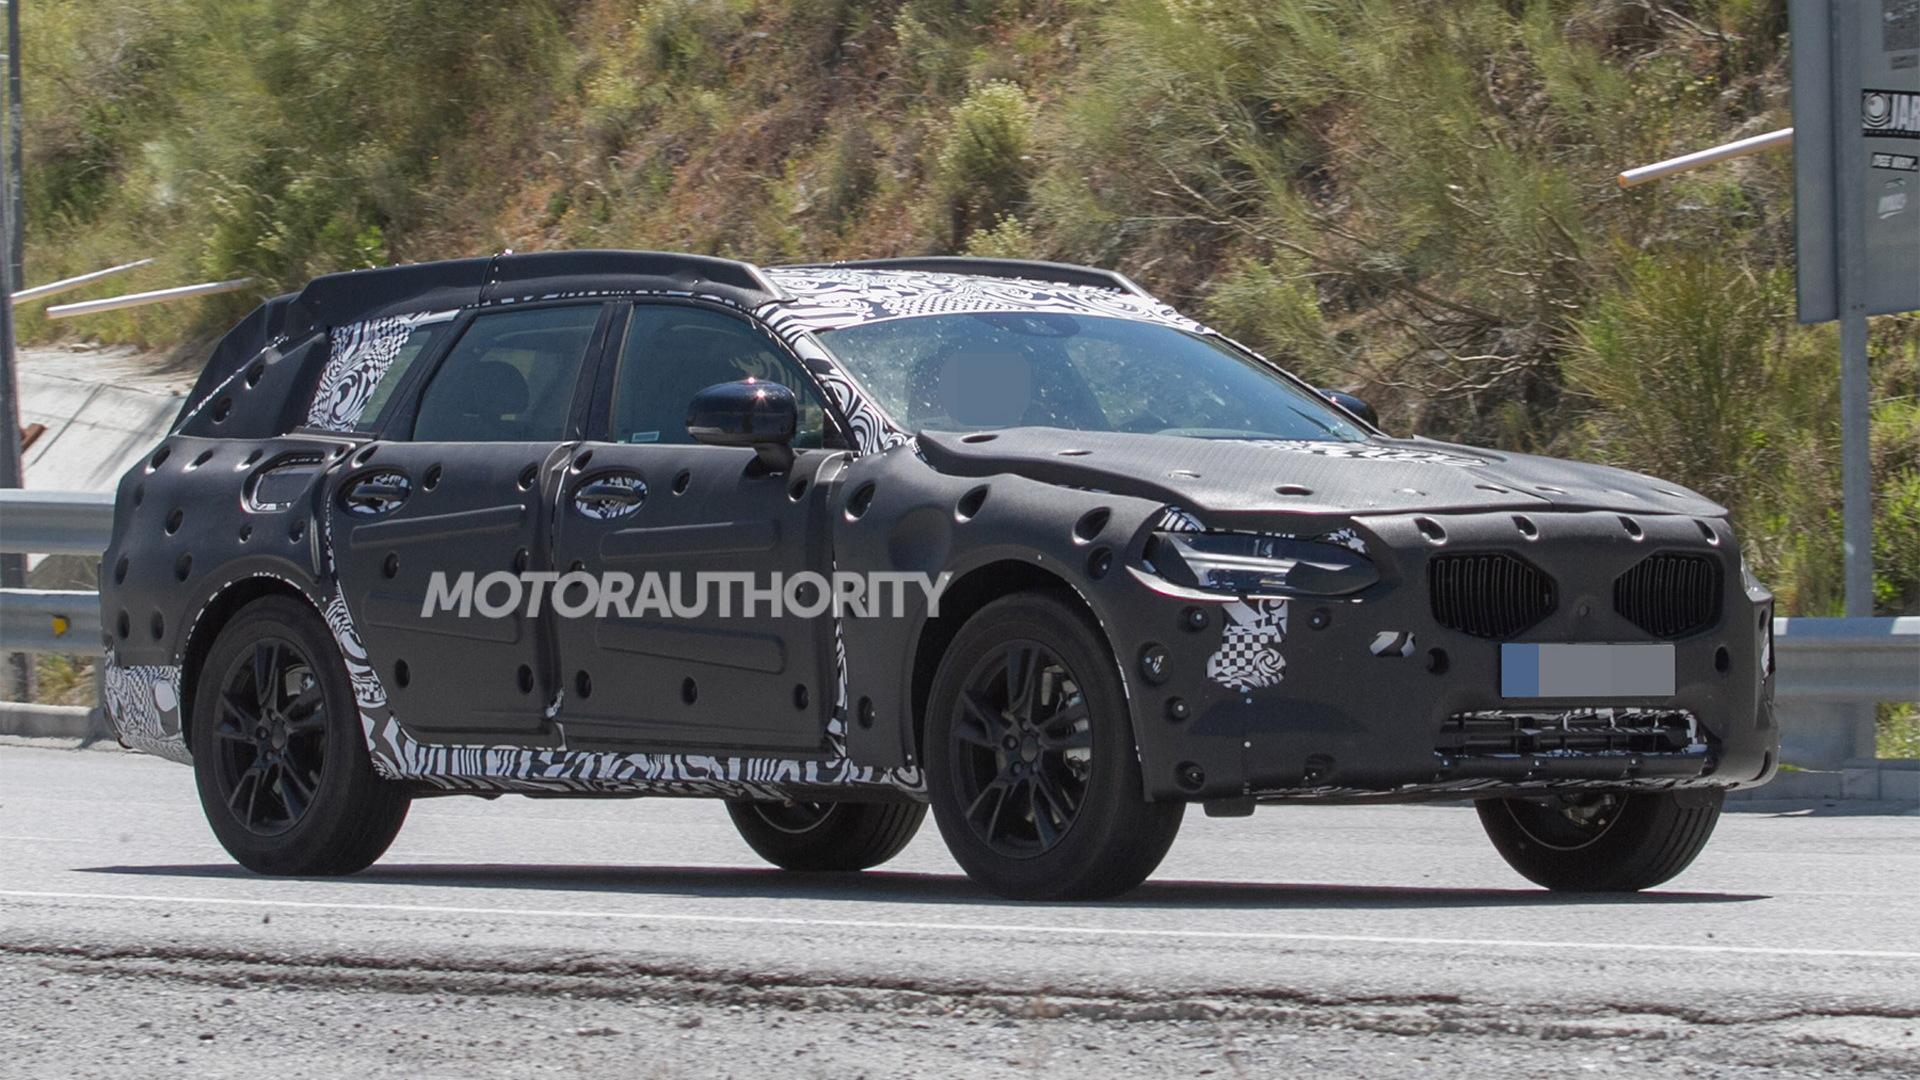 2018 Volvo V90 Cross Country spy shots - Image via S. Baldauf/SB-Medien